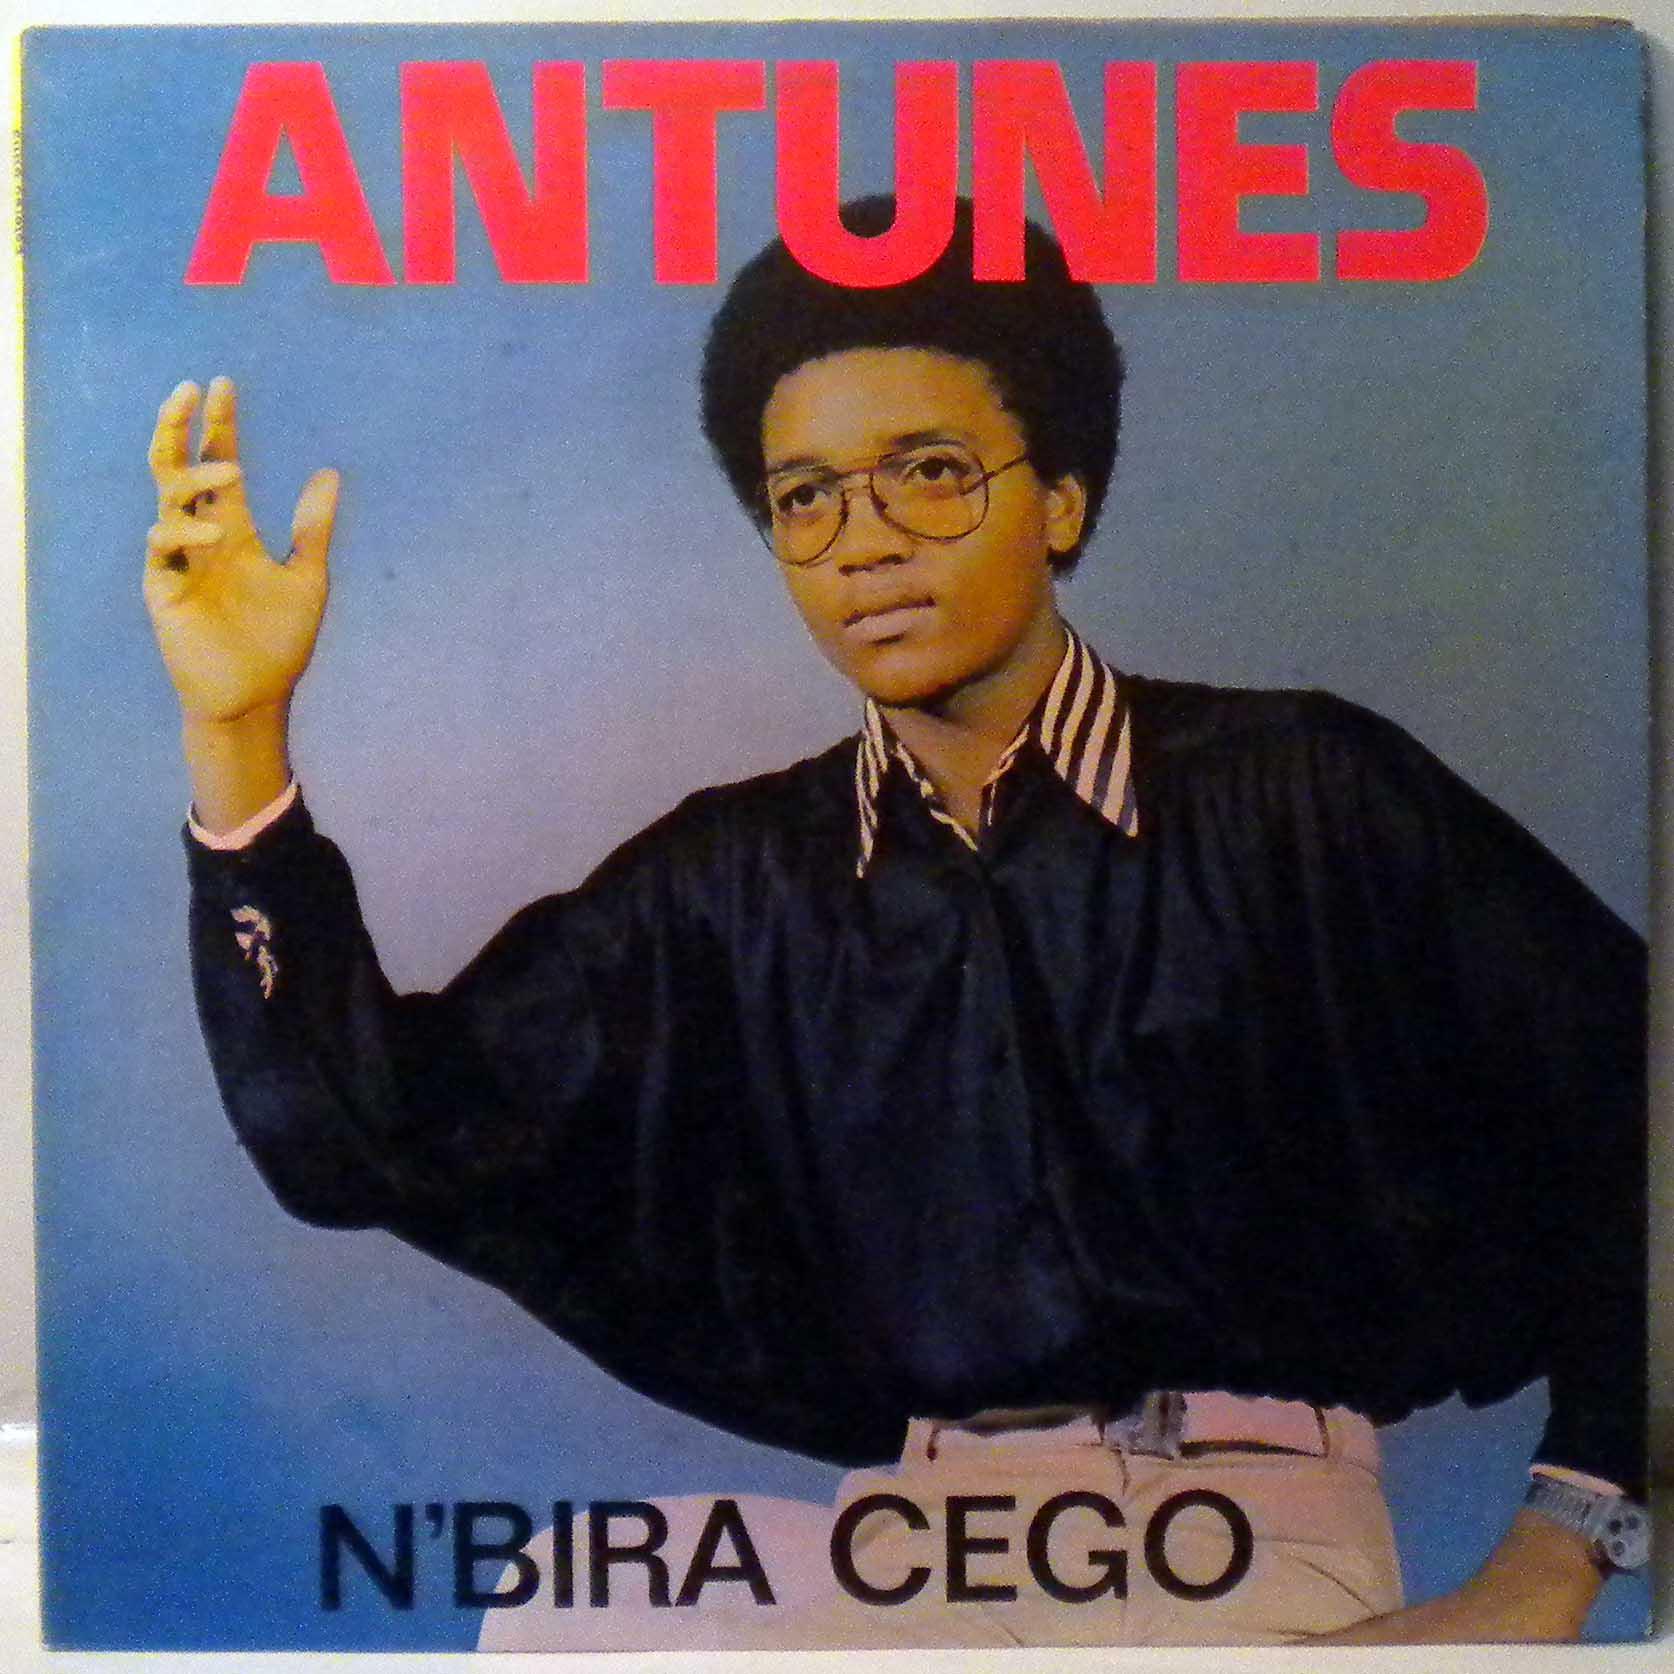 ANTUNES - N'bira cego - LP